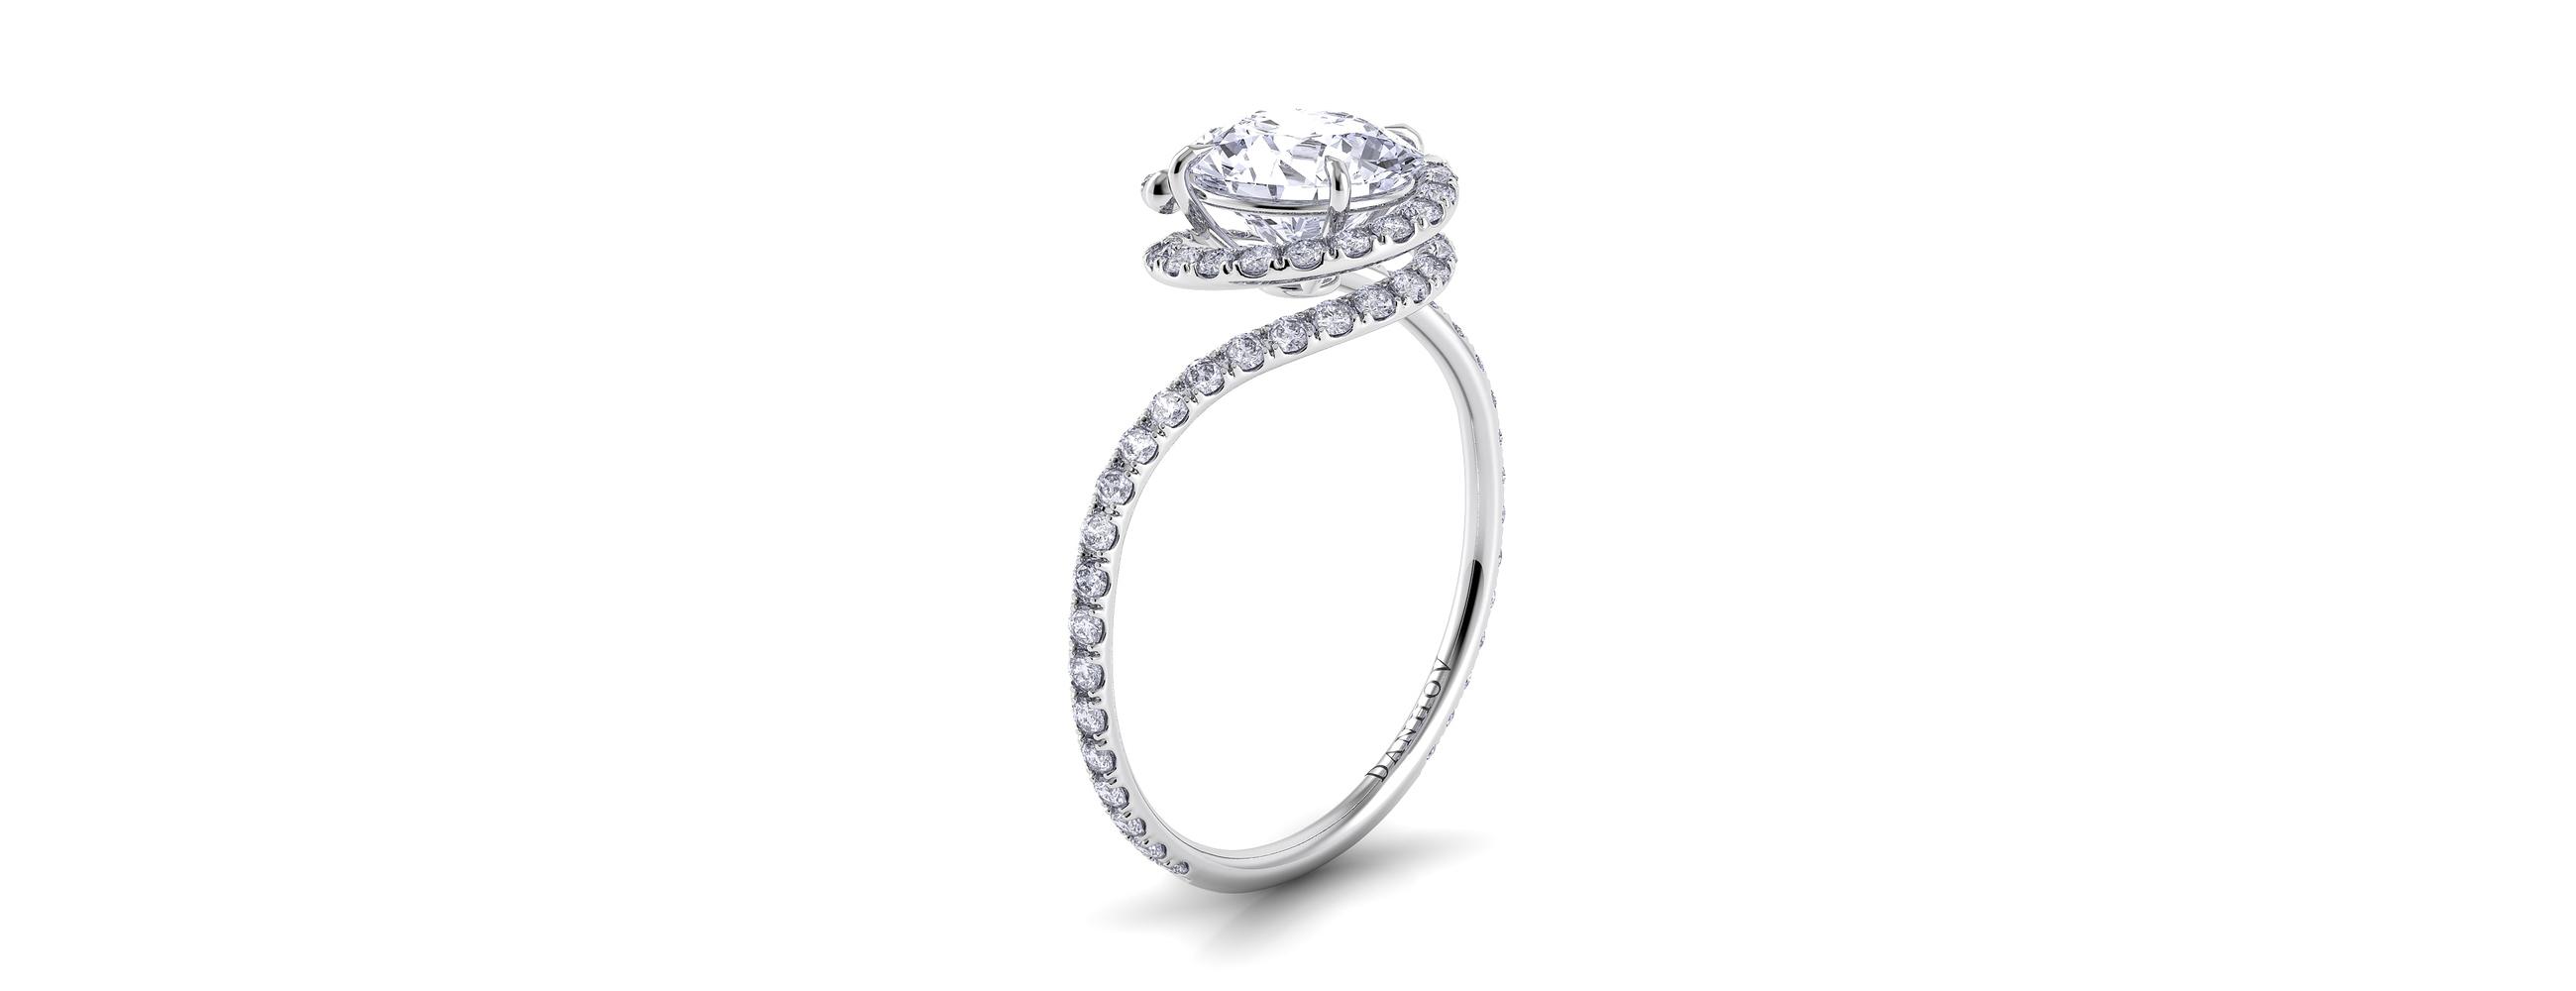 Danhov diamond engagement ring at Savvy+Sand